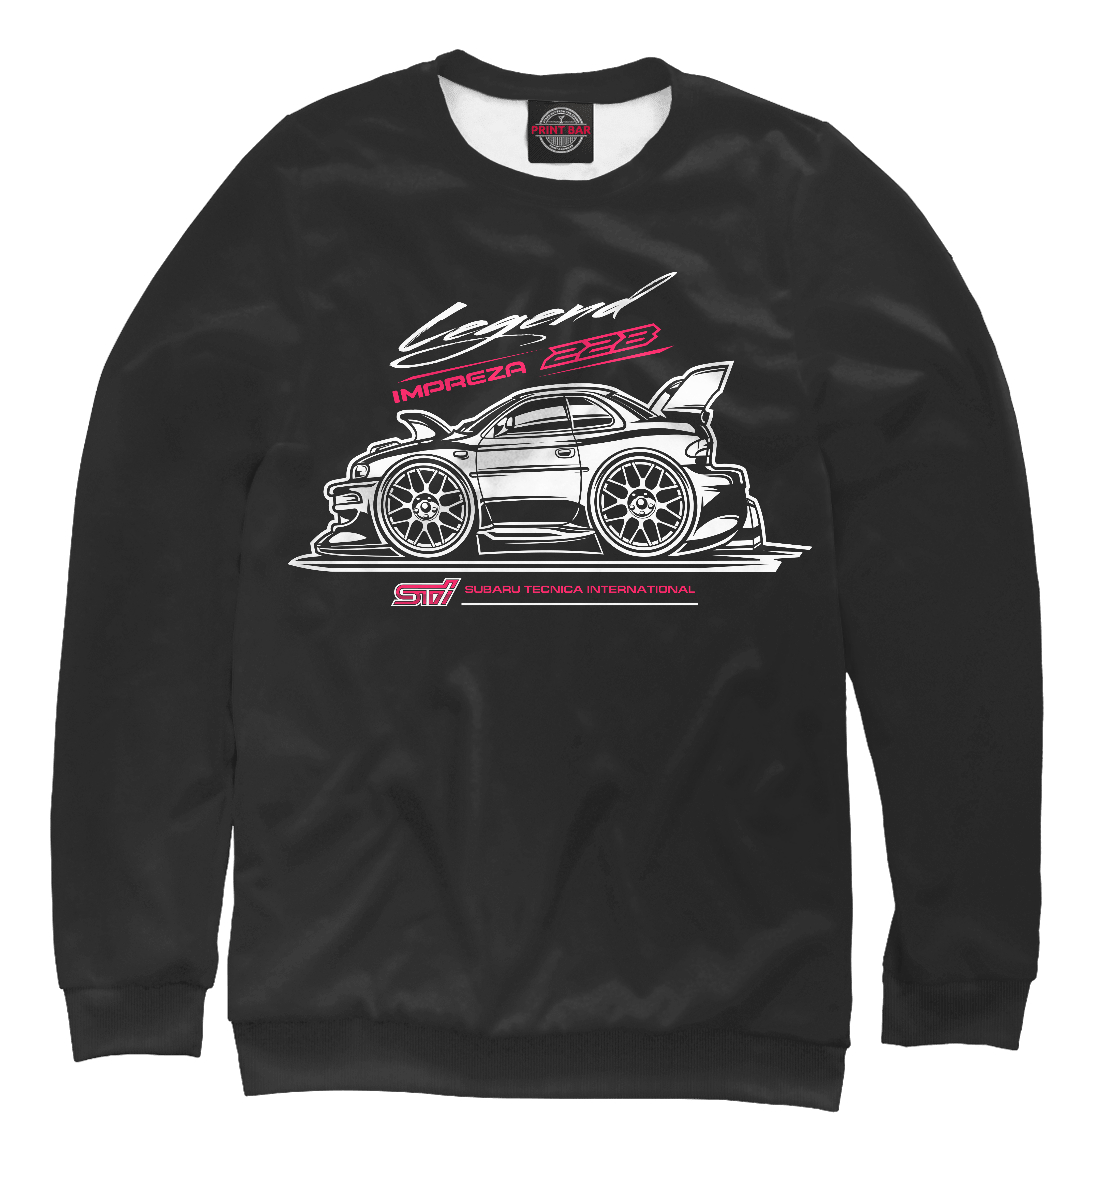 Купить Subaru 22b 2, Printbar, Свитшоты, SBR-775690-swi-2